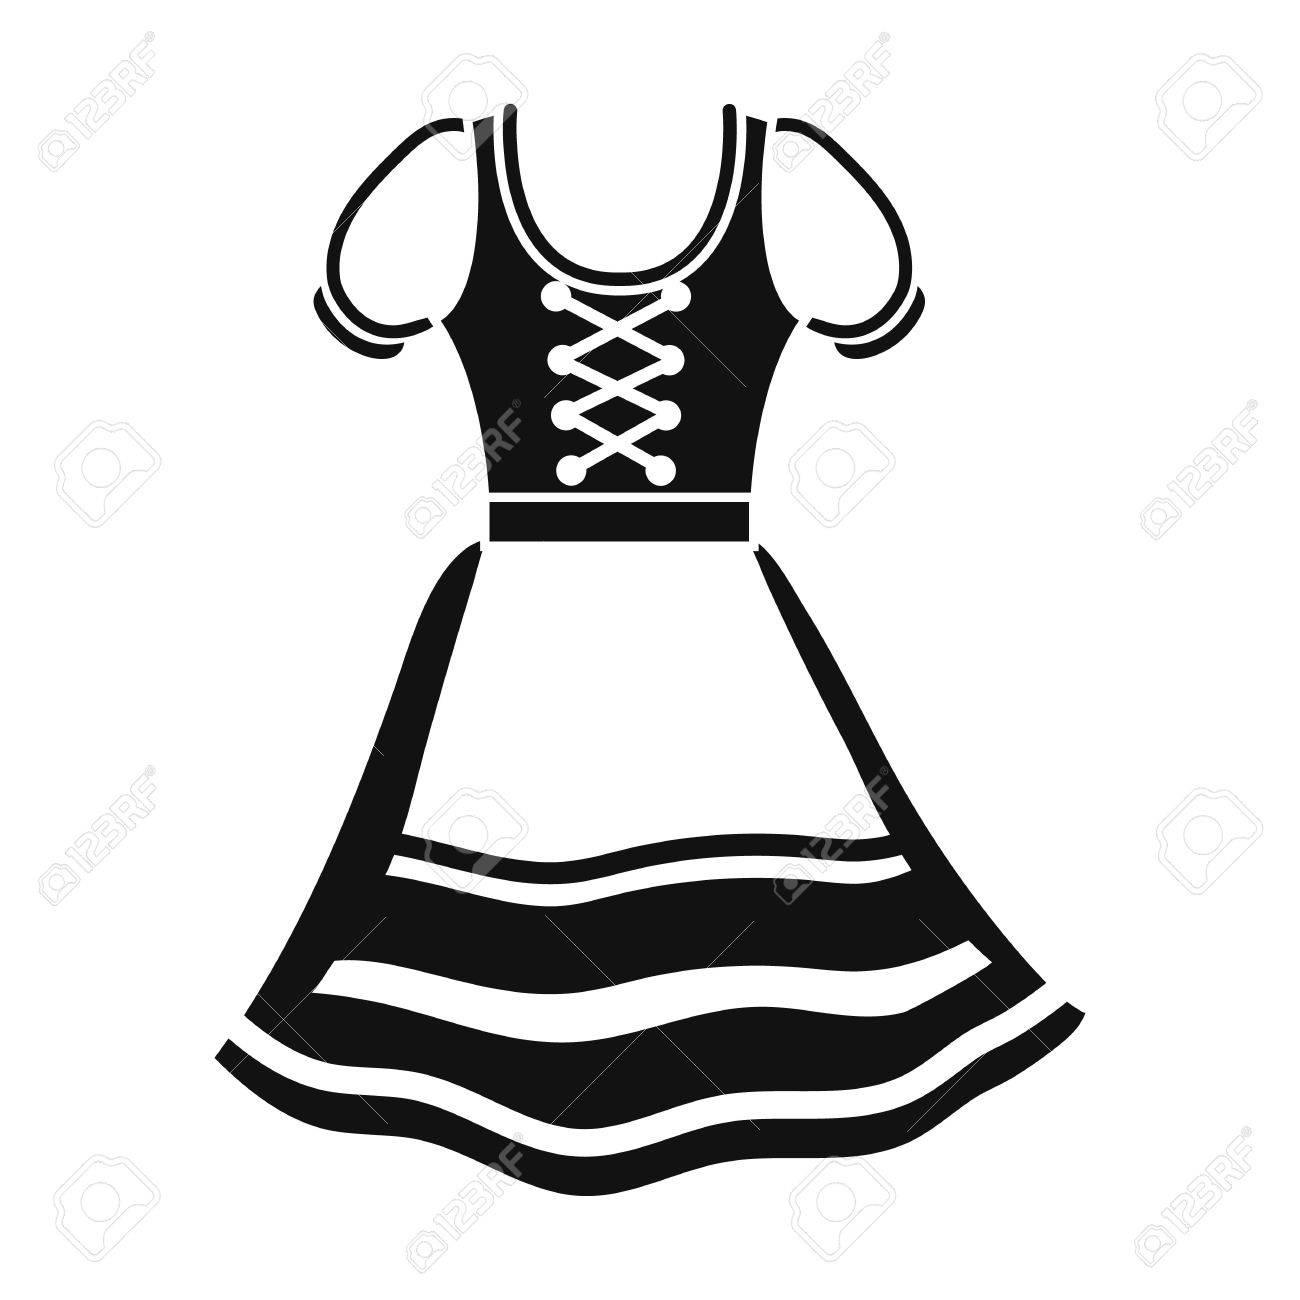 Dirndl icon in black style isolated on white background. Oktoberfest symbol vector illustration. - 64659079